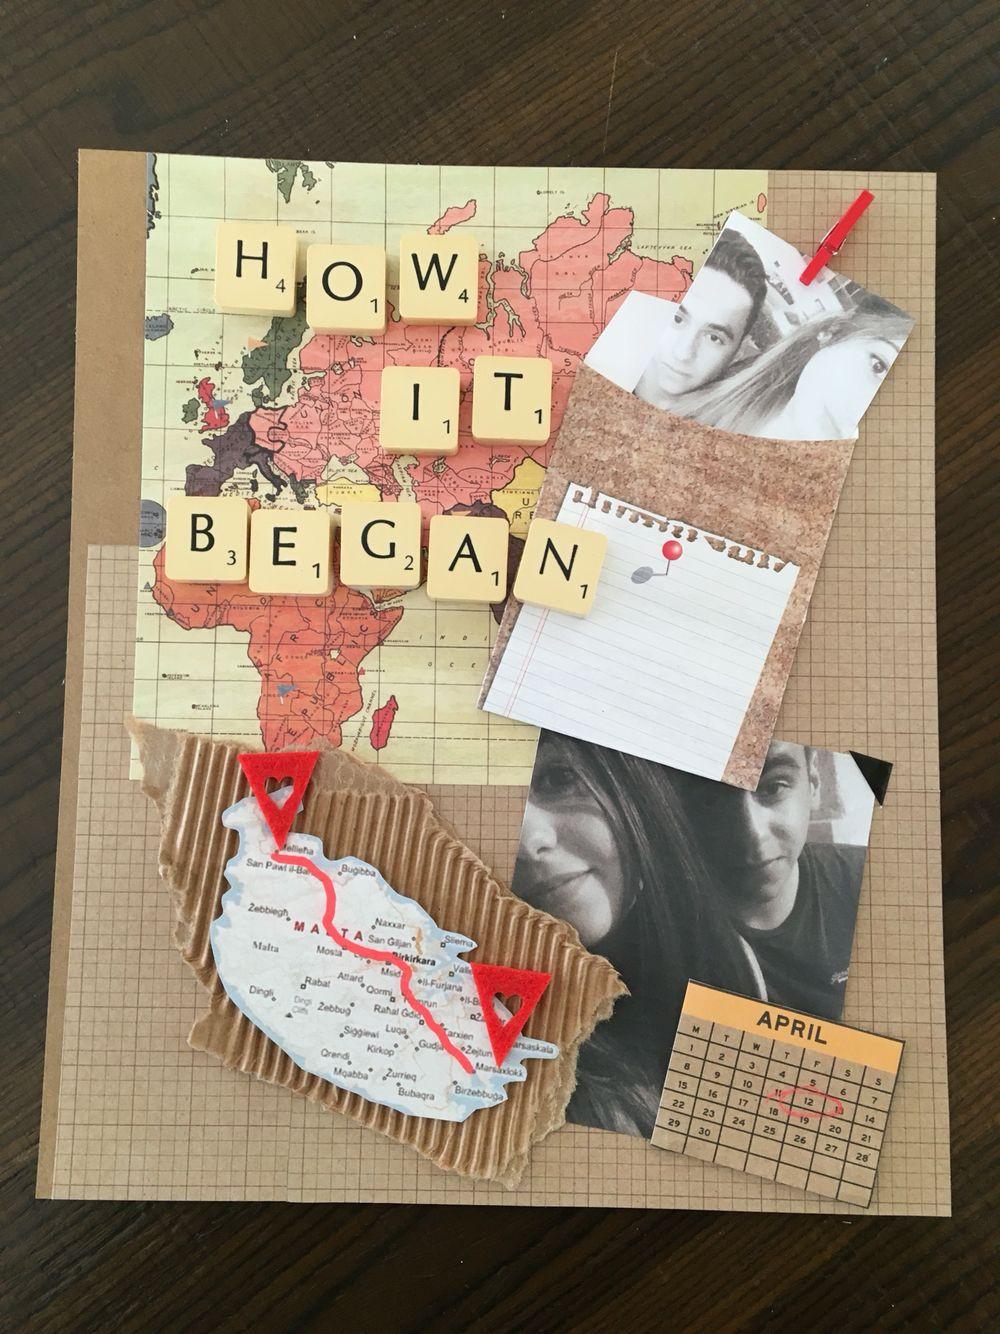 One Year Anniversary Gift Ideas For Boyfriend  Making a scrapbook for our one year anniversary Page one